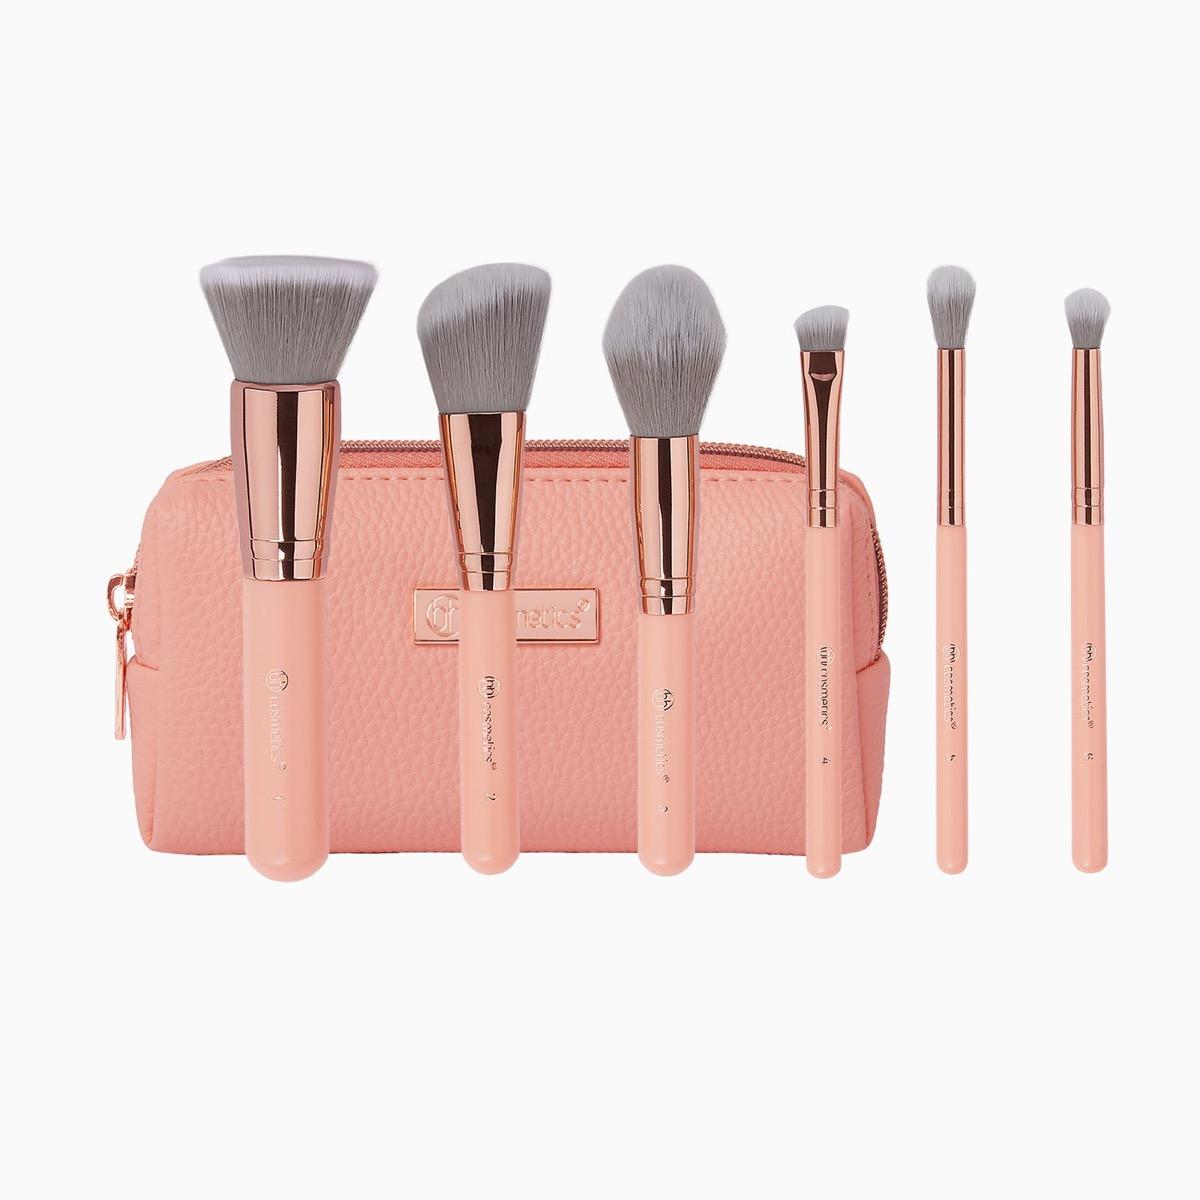 Mini Makeup Brush Set Travel Accessories